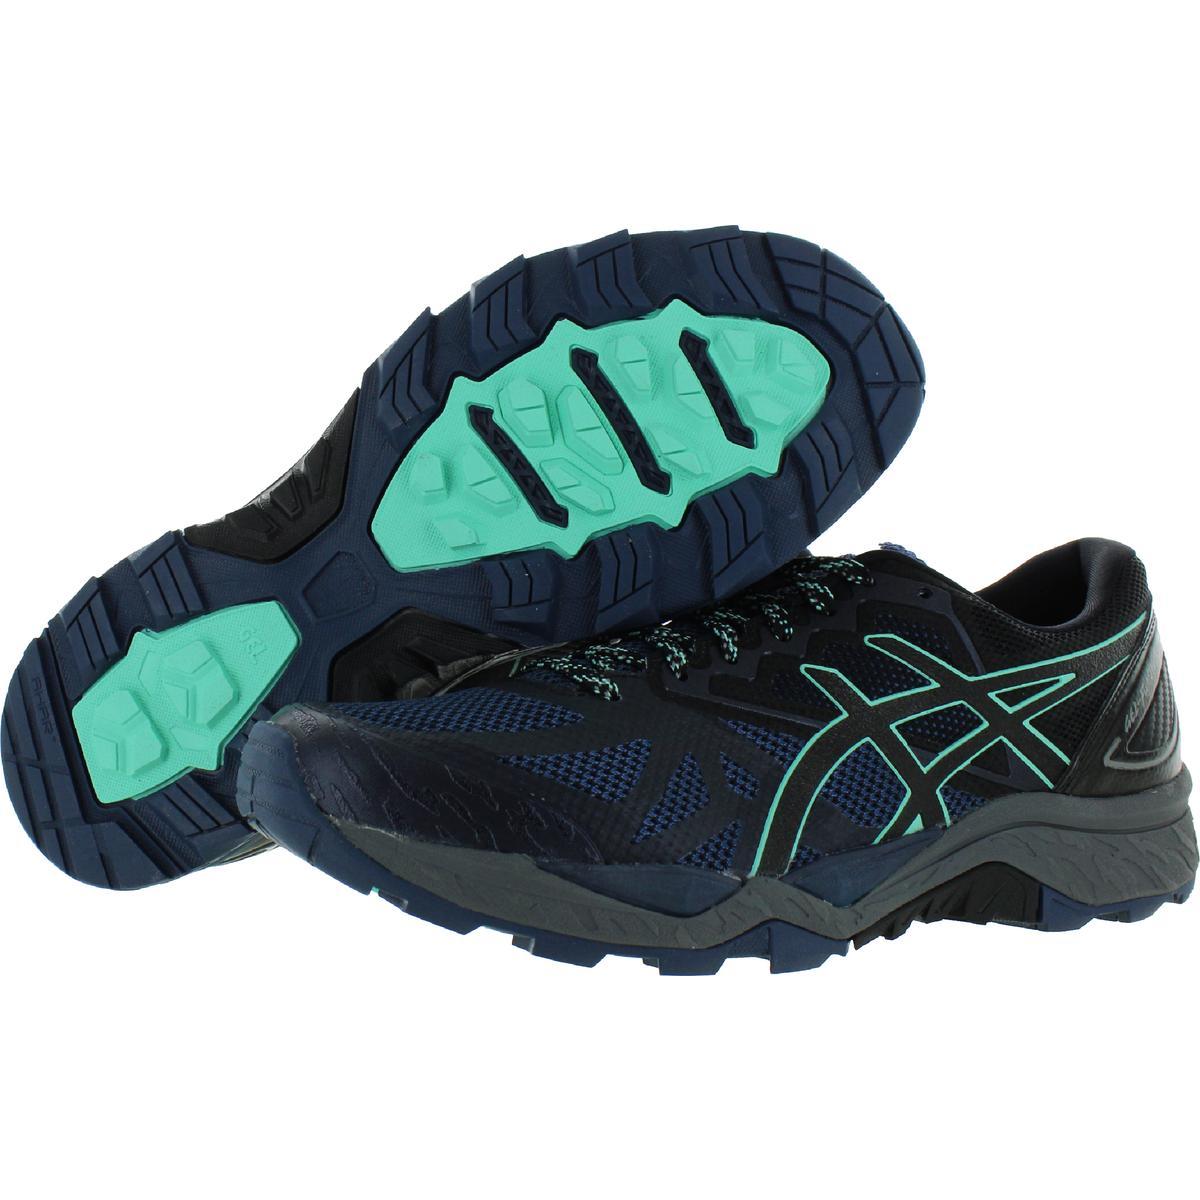 Asics-Womens-Gel-Fuji-Trabuco-6-Athletic-Running-Shoes-Sneakers-BHFO-7368 thumbnail 5